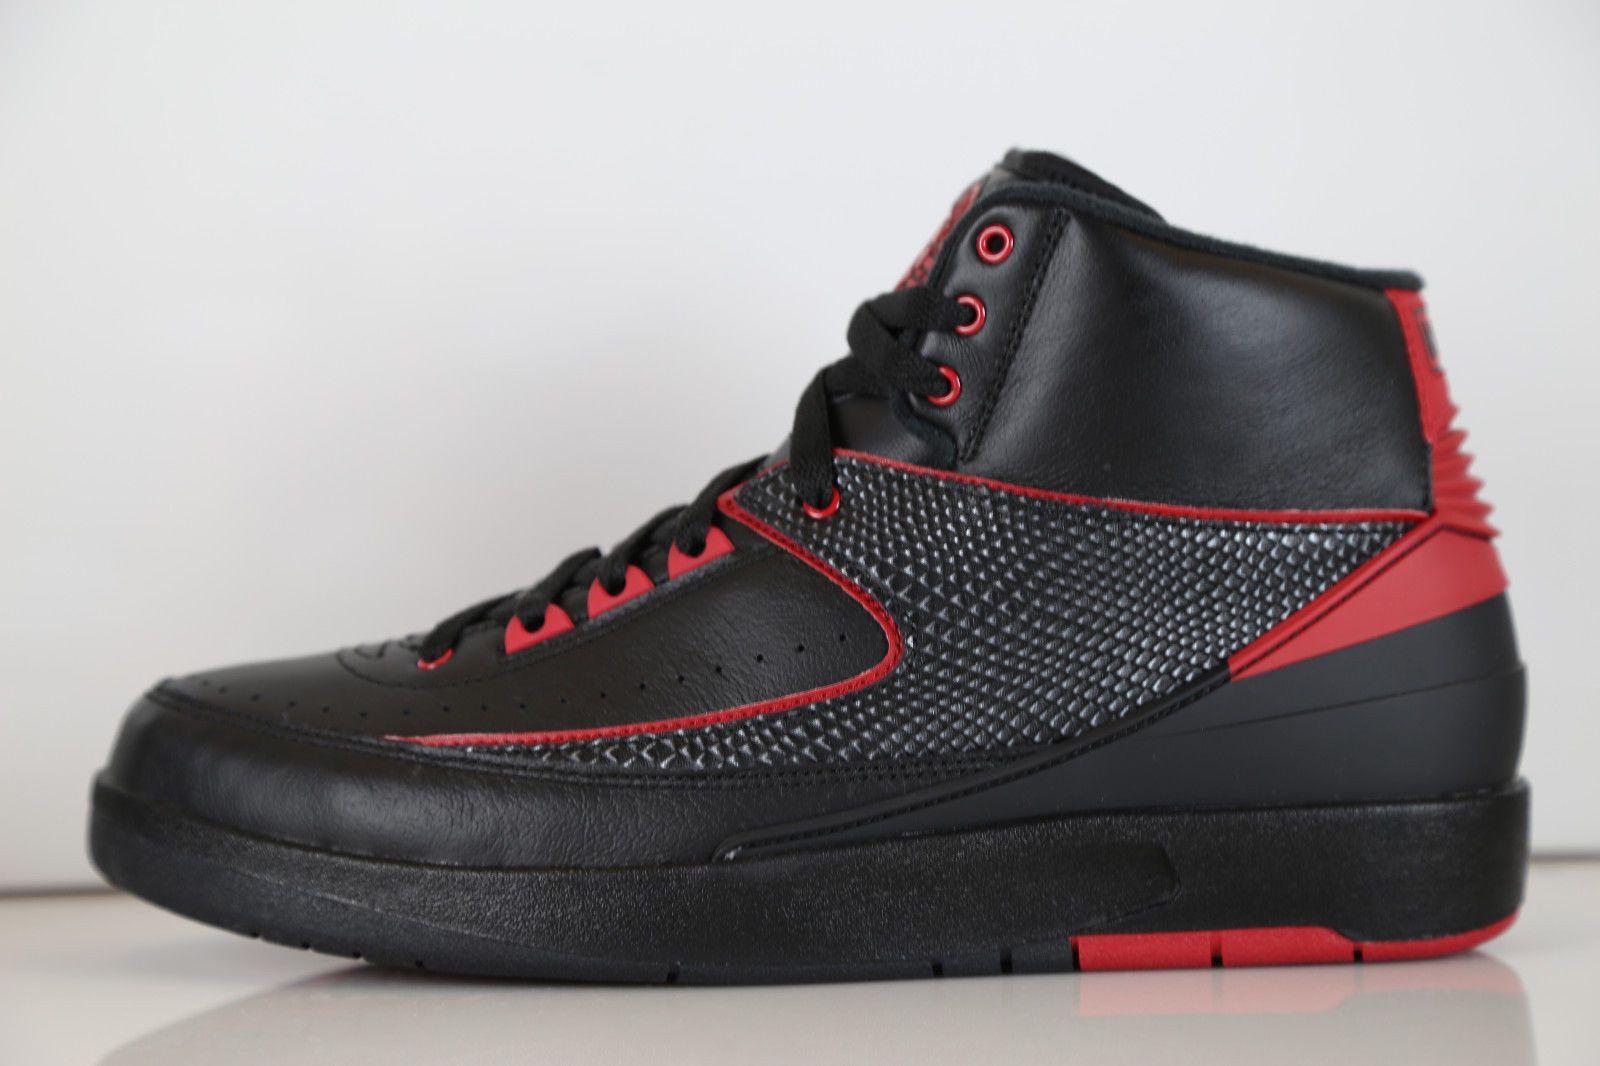 3db4fd8ff28bb0 Nike Air Jordan Retro 2 Alternate 87 Black Red 834274-001 7-14 1 bred 11 3  8 9